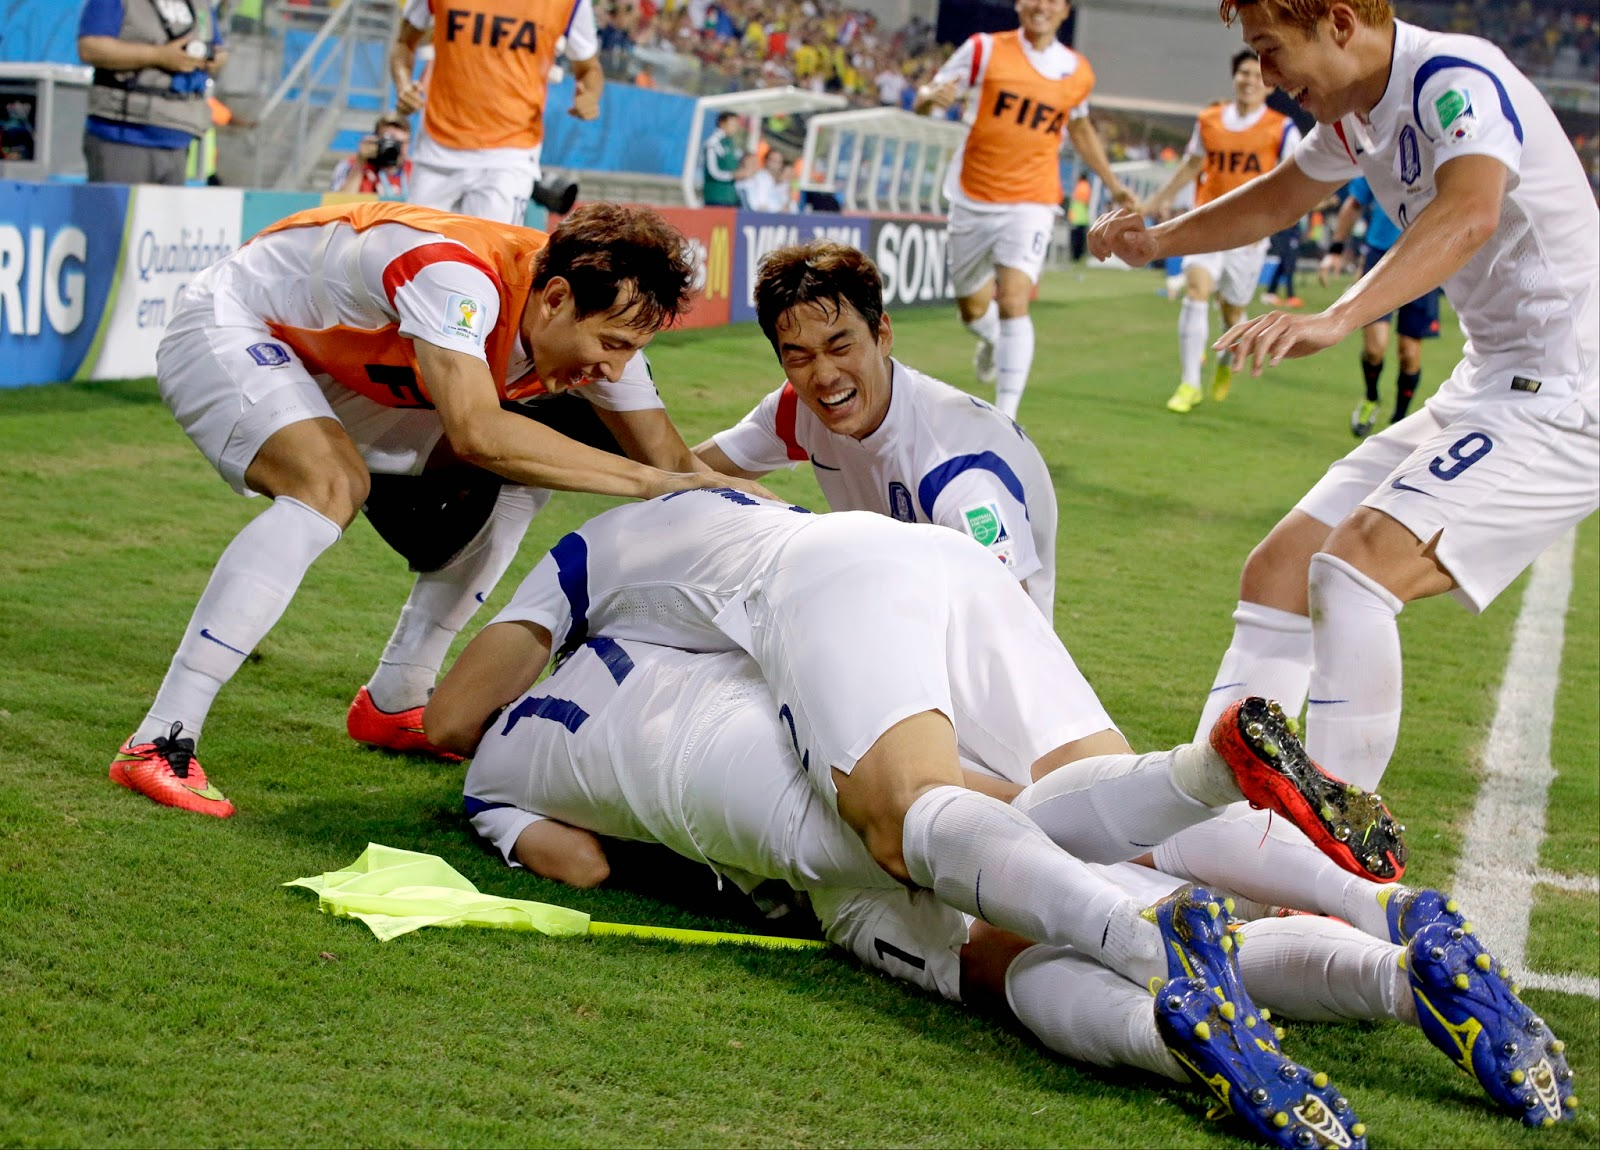 Прогноз Футбола Южная Кореа Алжир